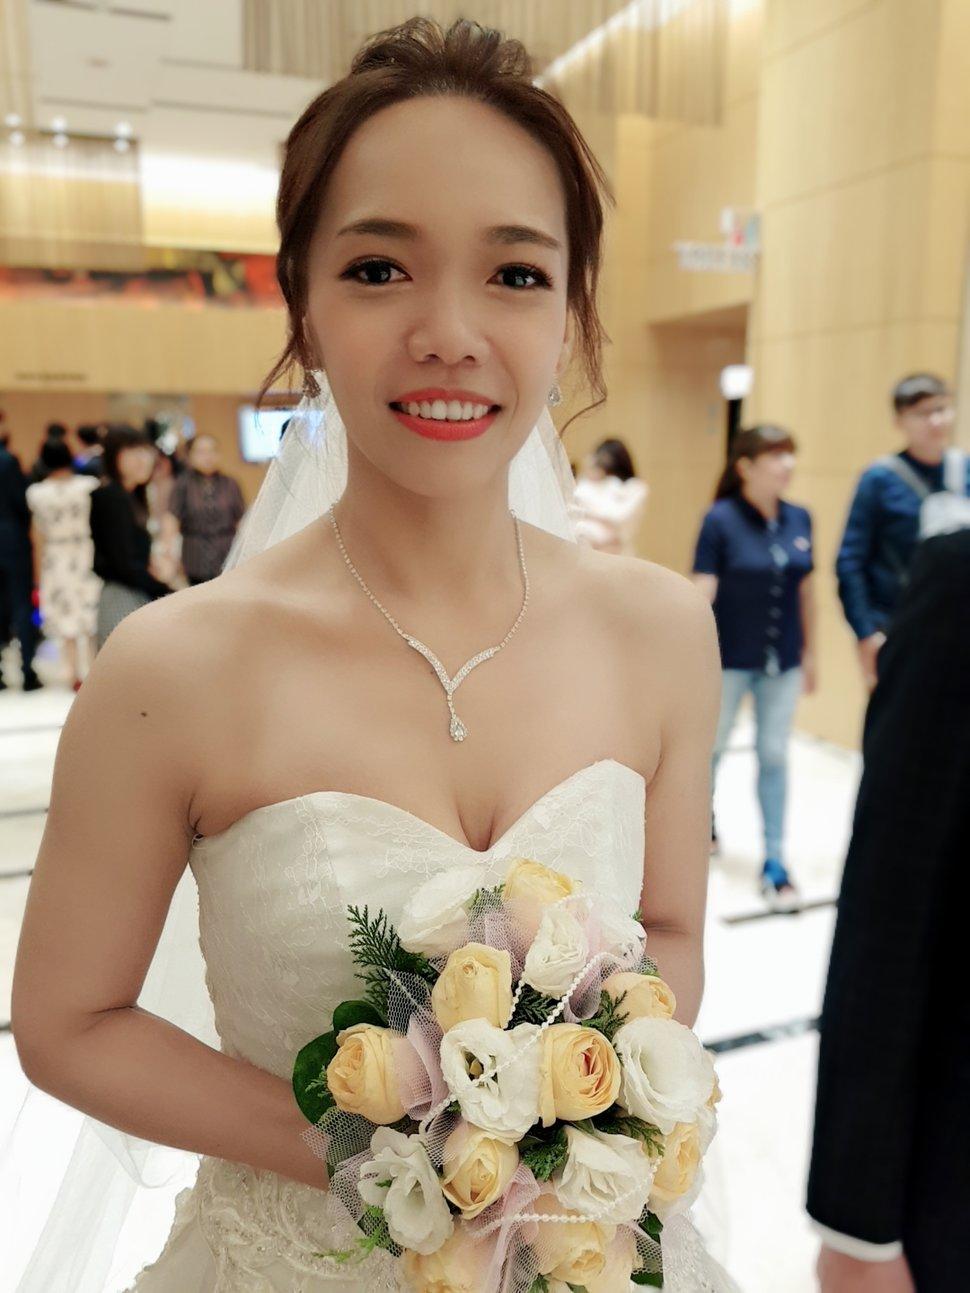 MYXJ_20190918230923_save - Serin Style曦式玩美造型《結婚吧》